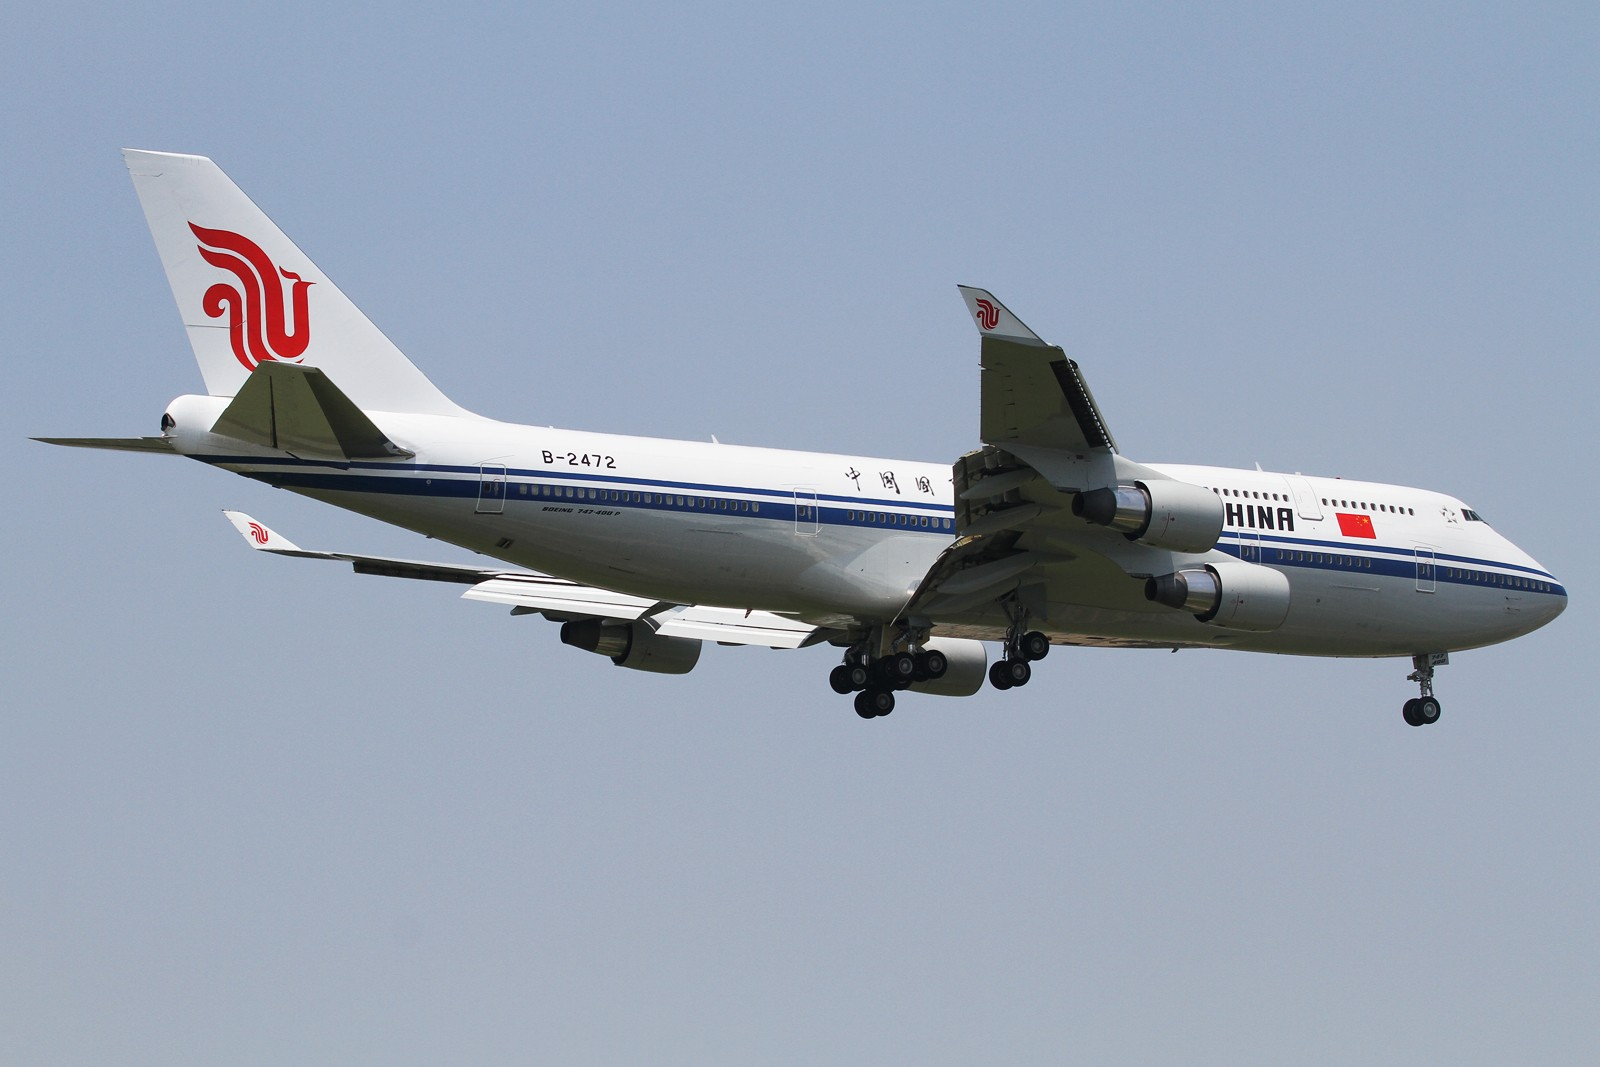 Re:[原创]【SHA/PVG/NKG/HKG/PEK】***********2014年度总结*********** BOEING 747-400 B-2472 中国北京首都国际机场